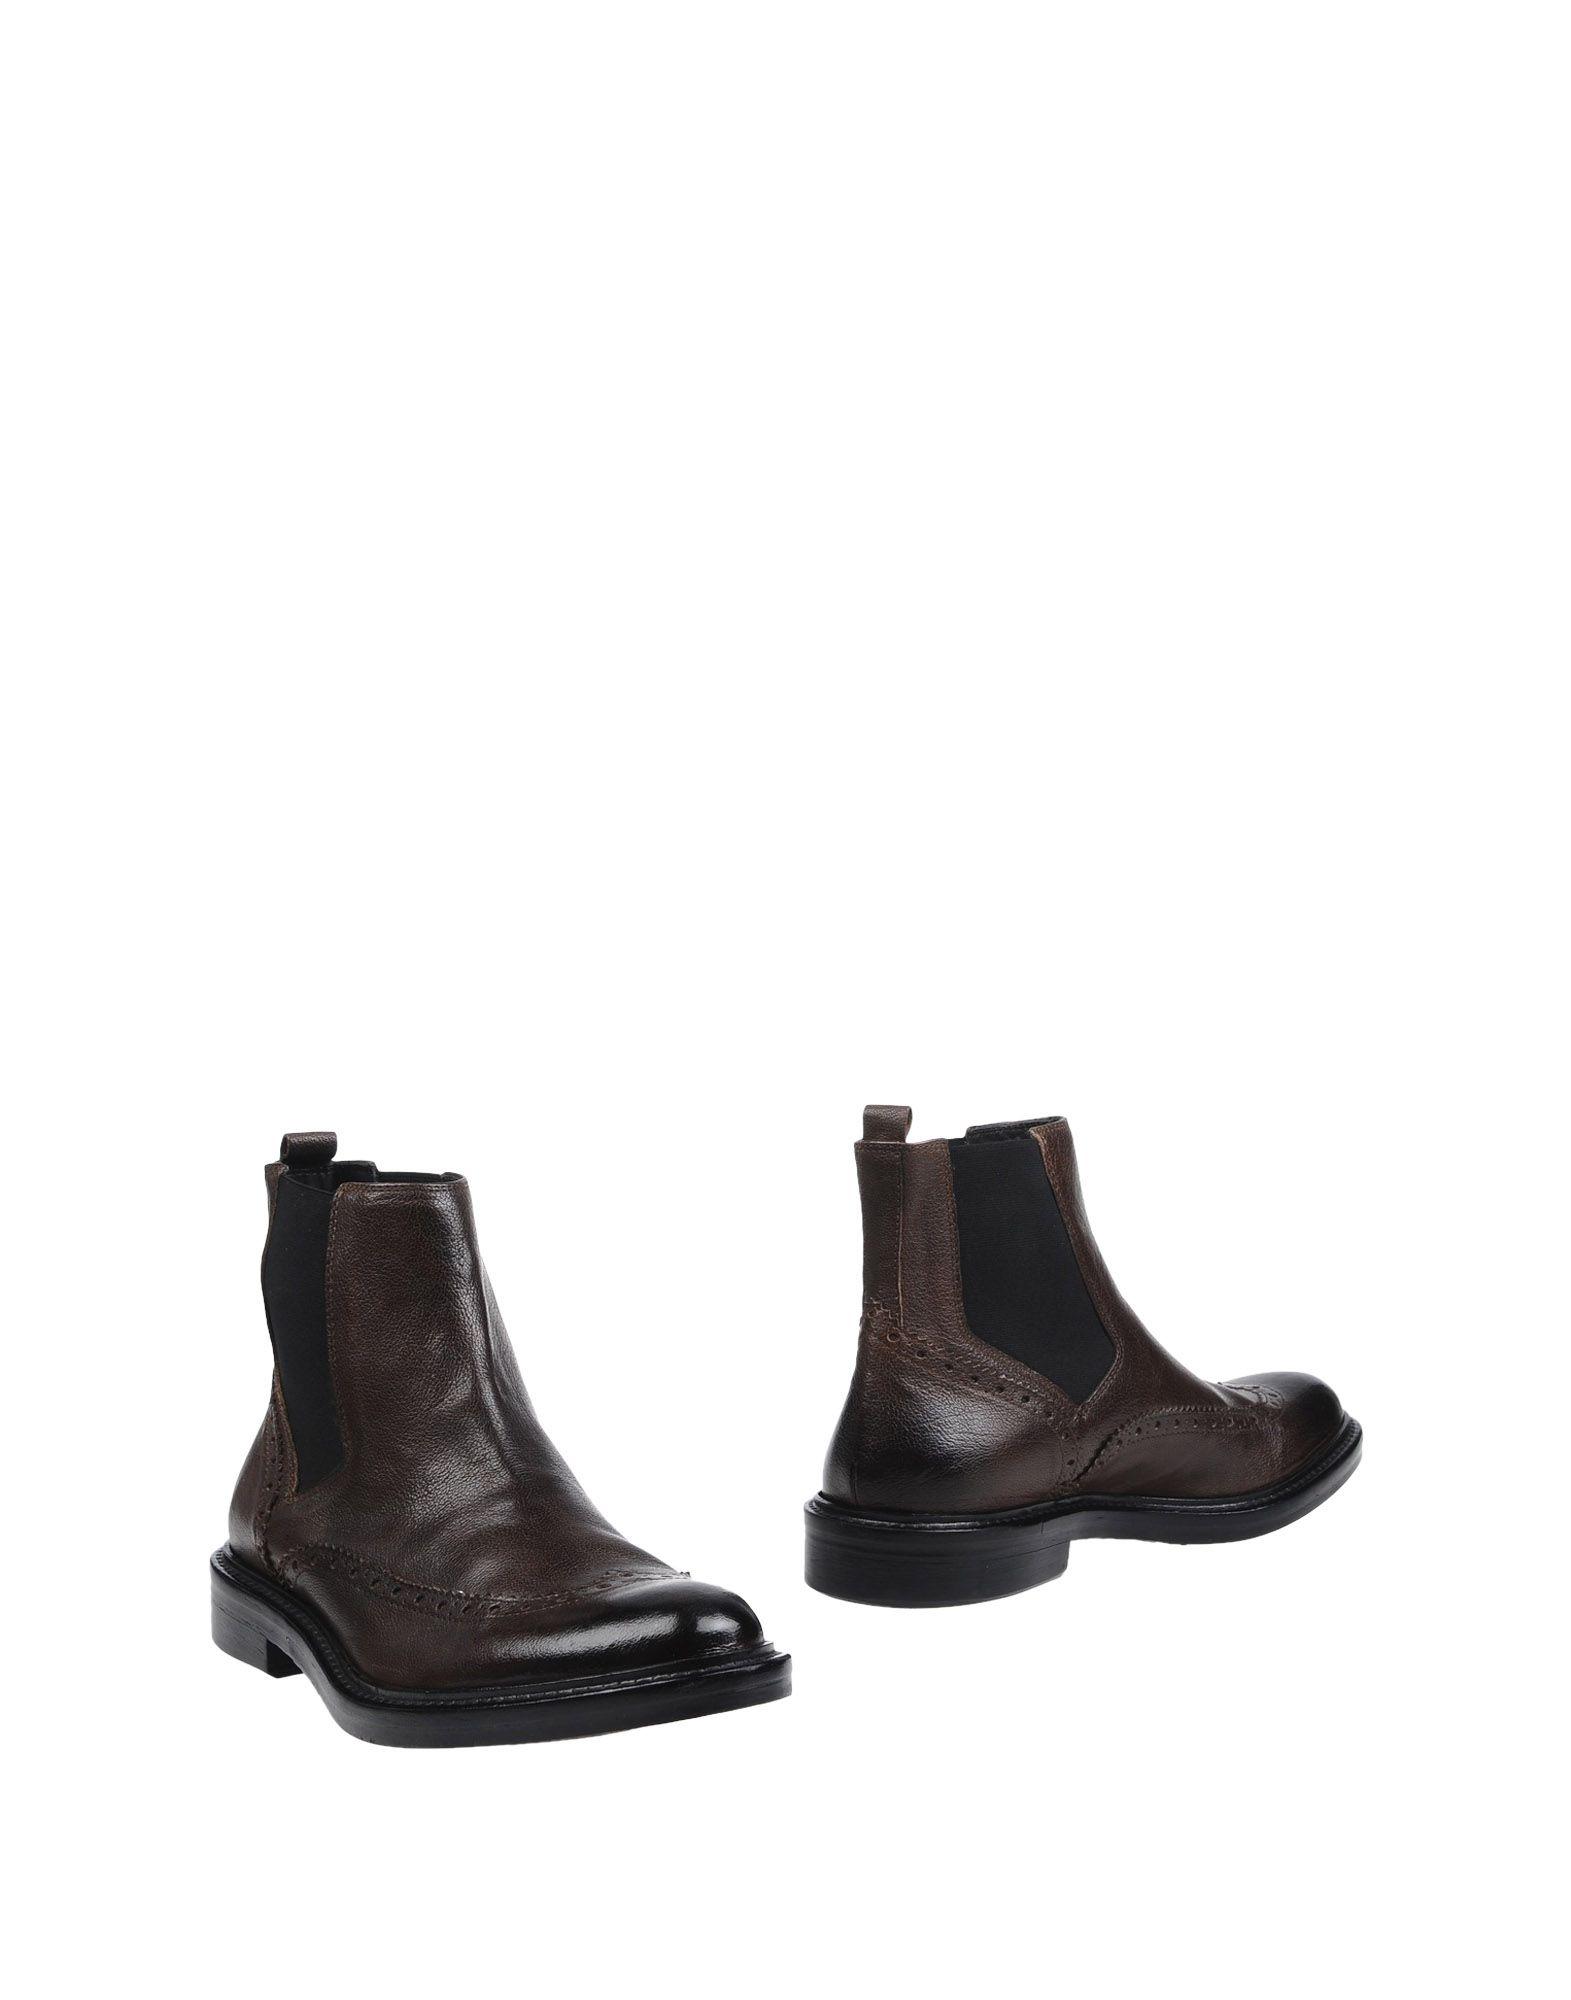 Rabatt echte Schuhe  Kingston Stiefelette Herren  Schuhe 11266511SP acce6e